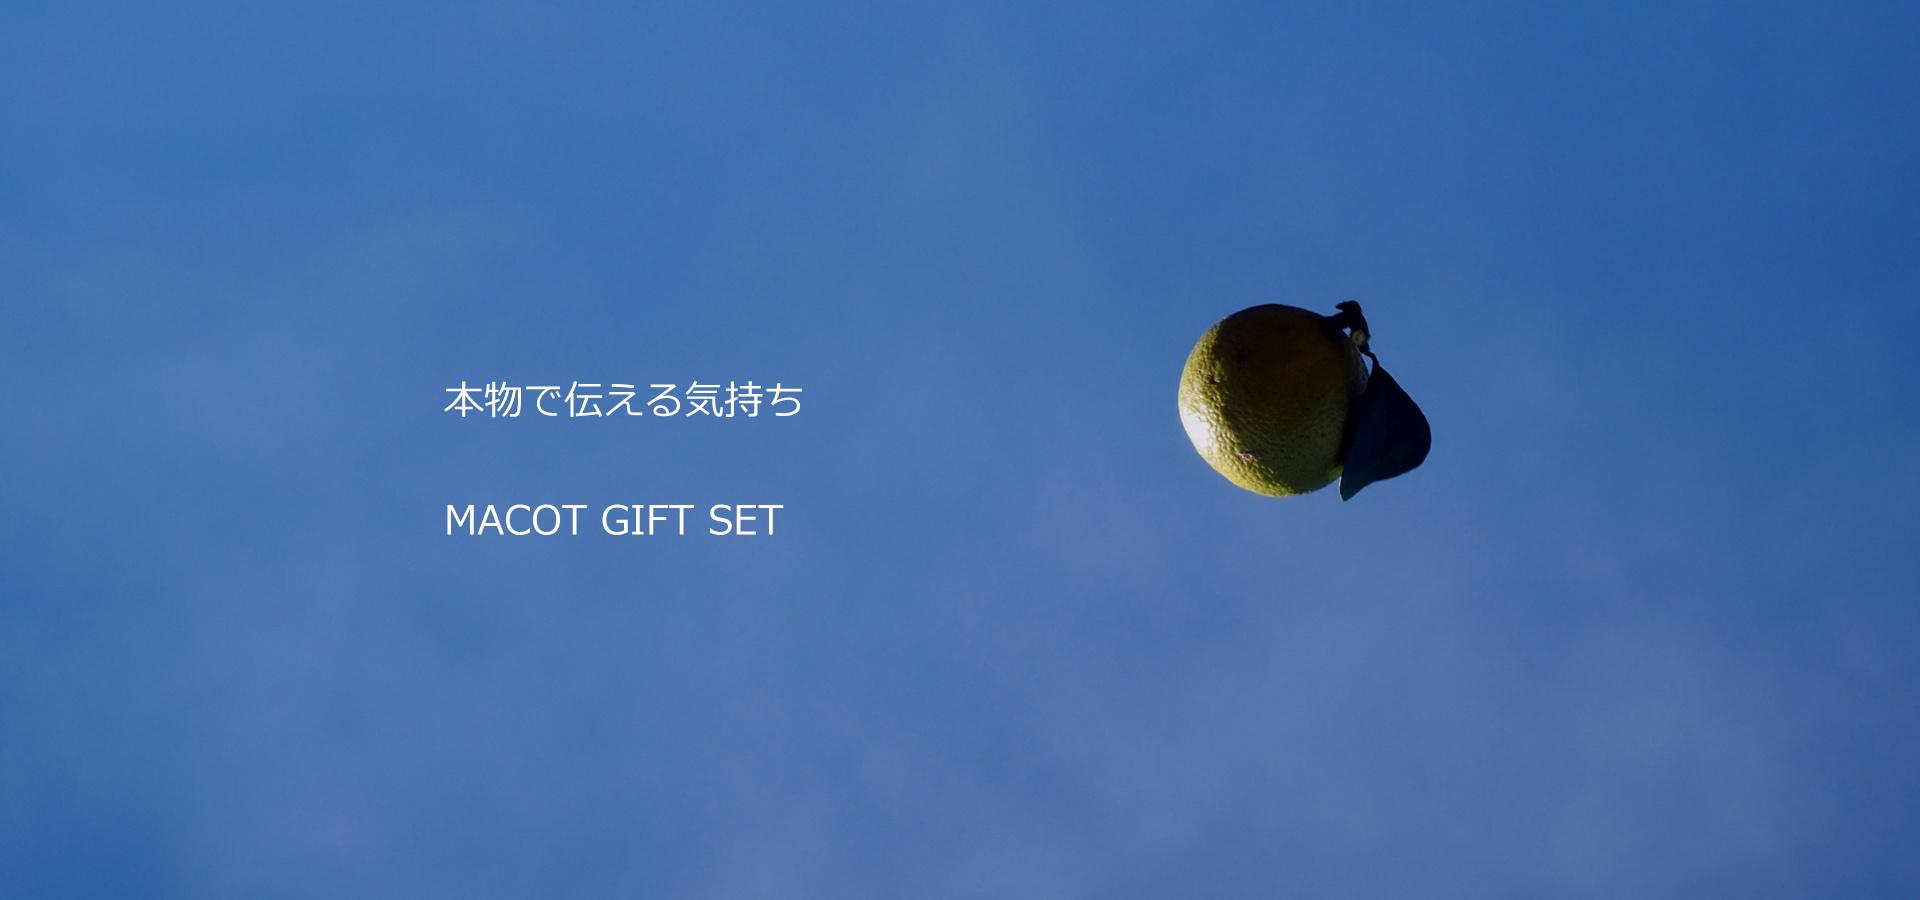 MACOT GIFT